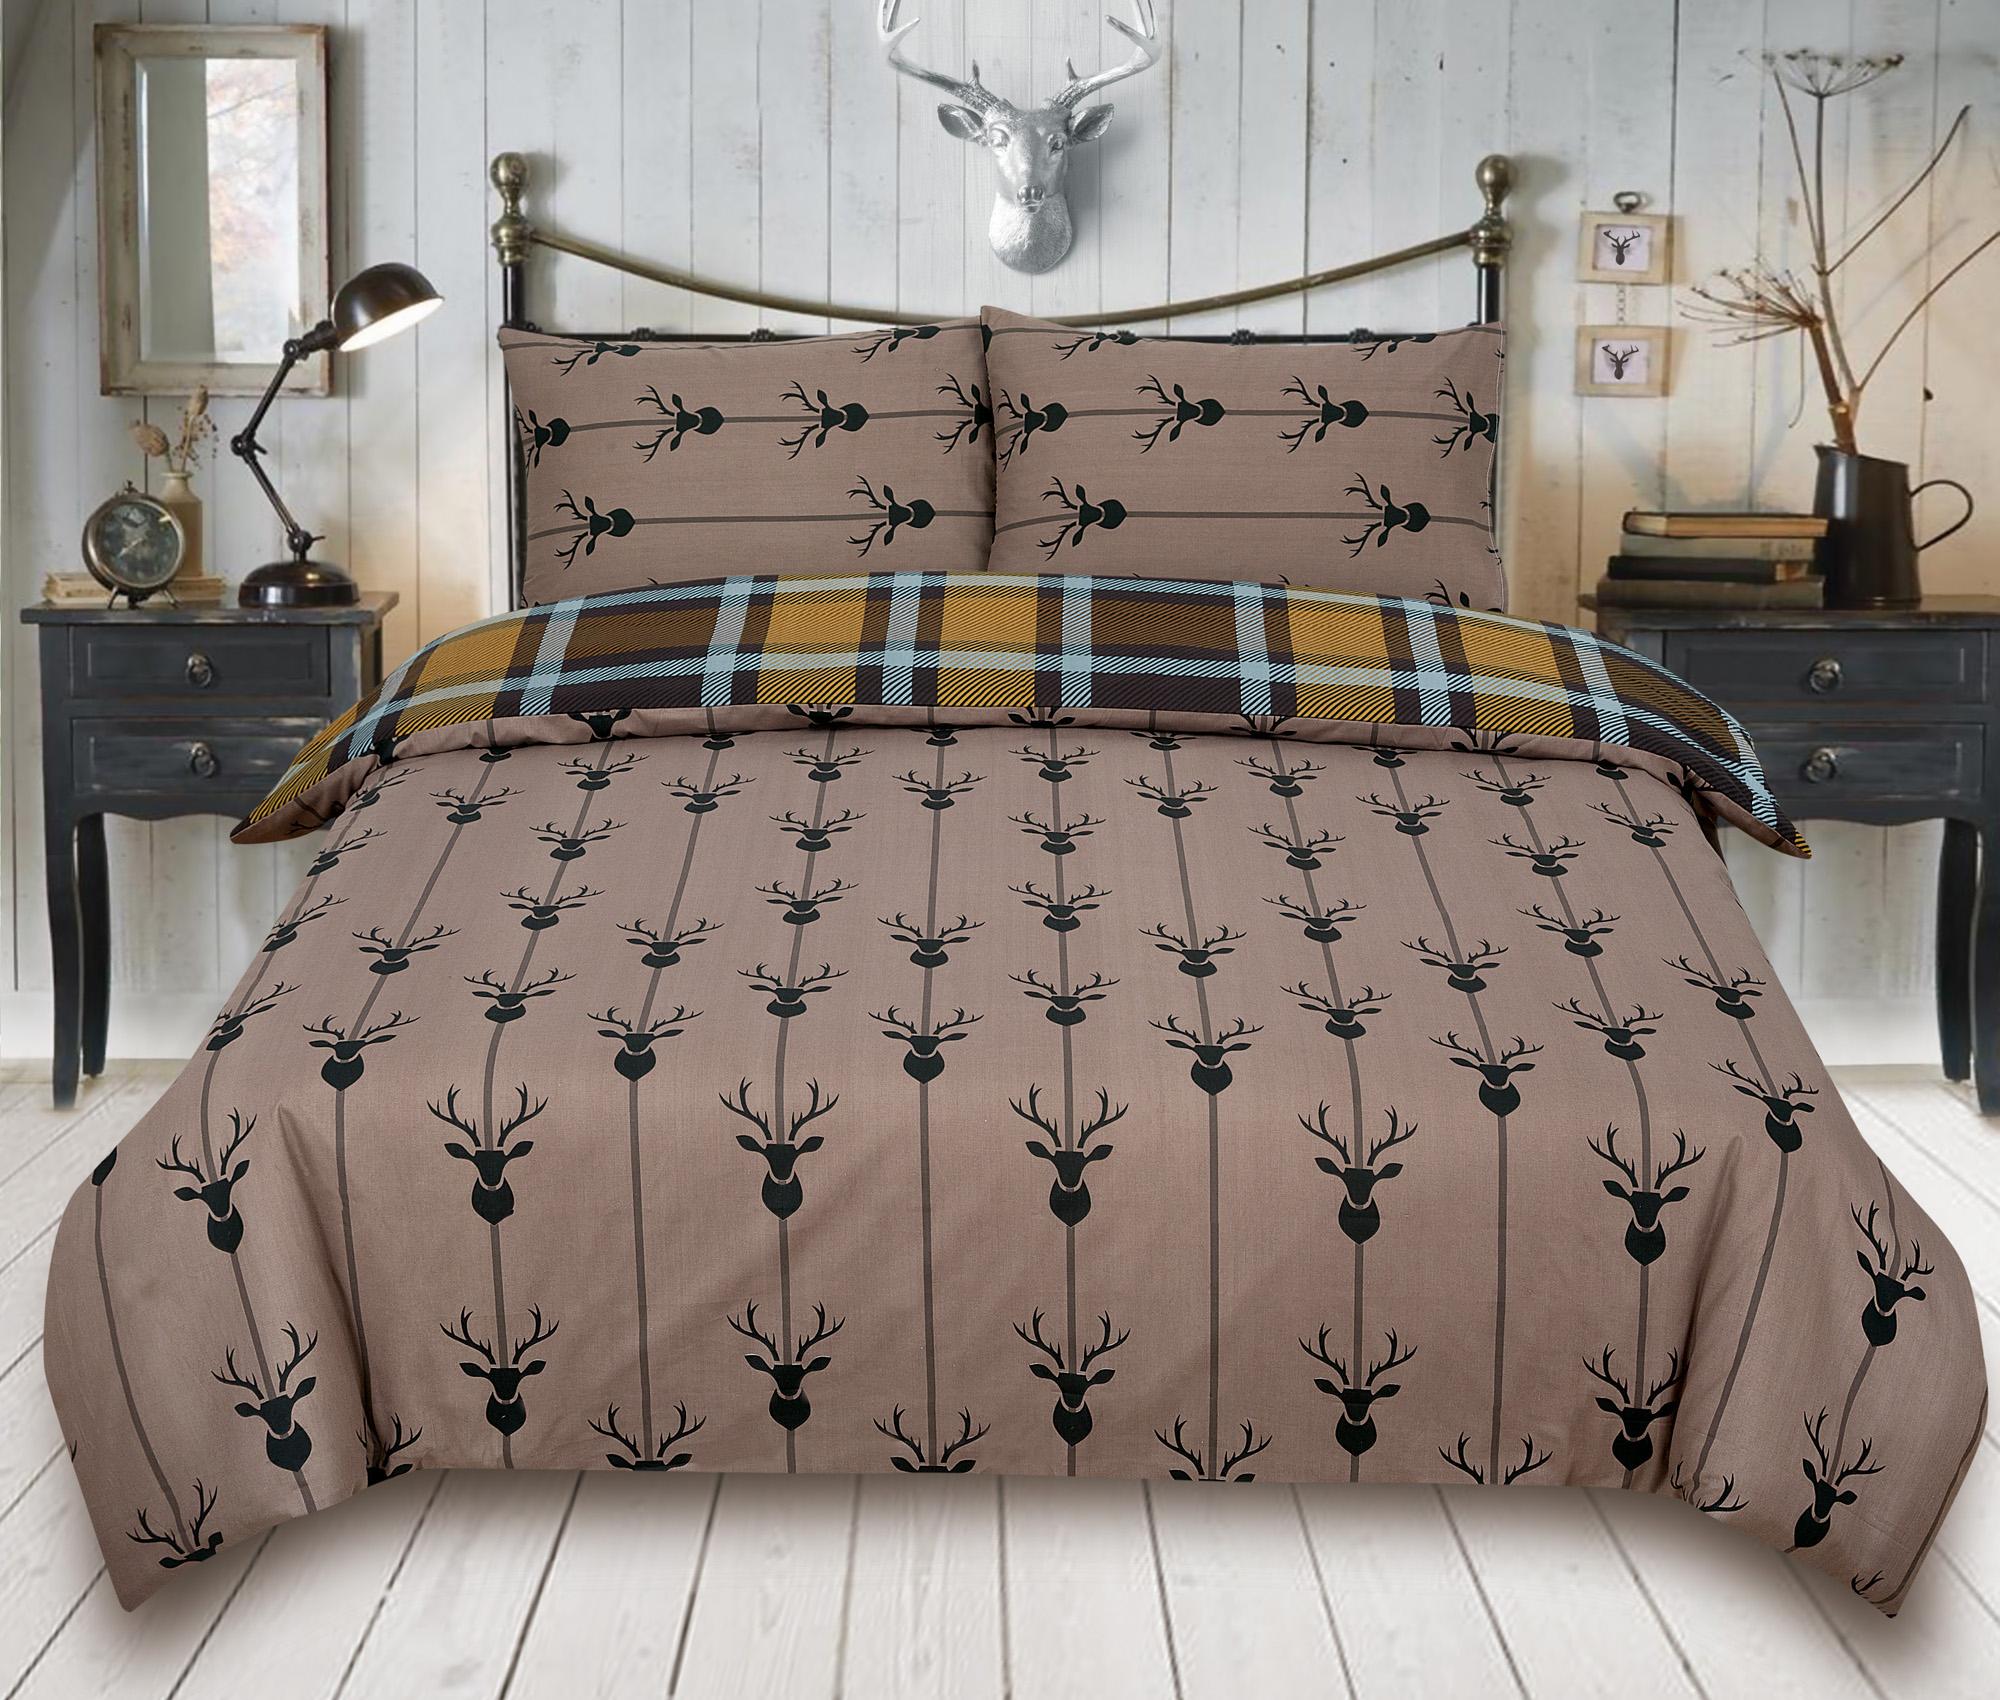 Check-Stag-Tartan-Deer-Antlers-Bedding-Single-Double-King-Duvet-Quilt-Cover-Set miniatura 5